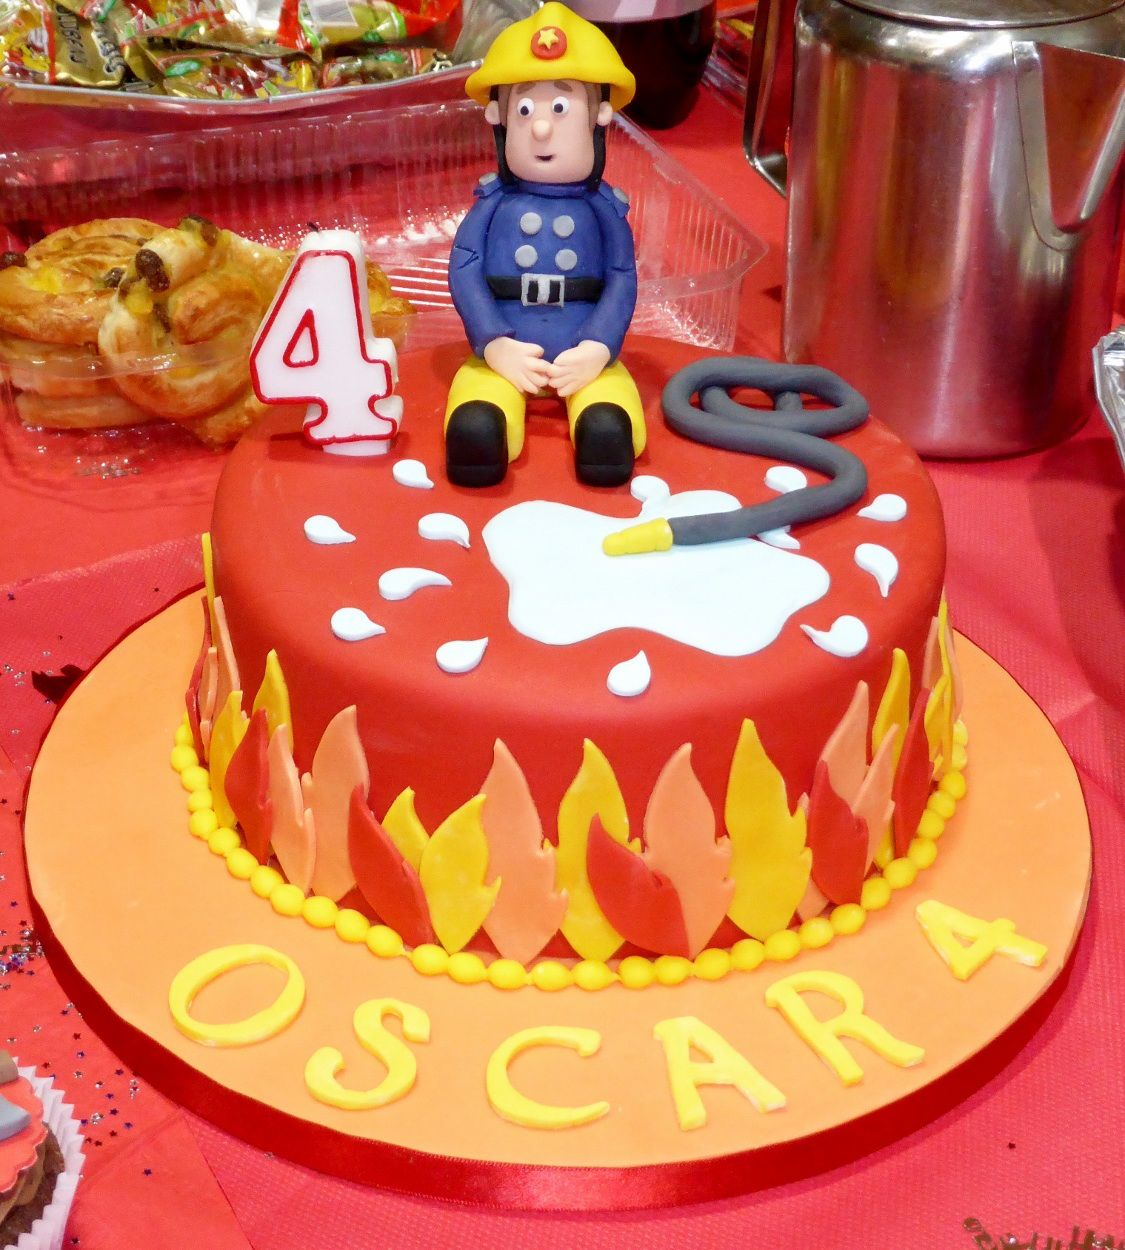 Fireman Shaped Cake